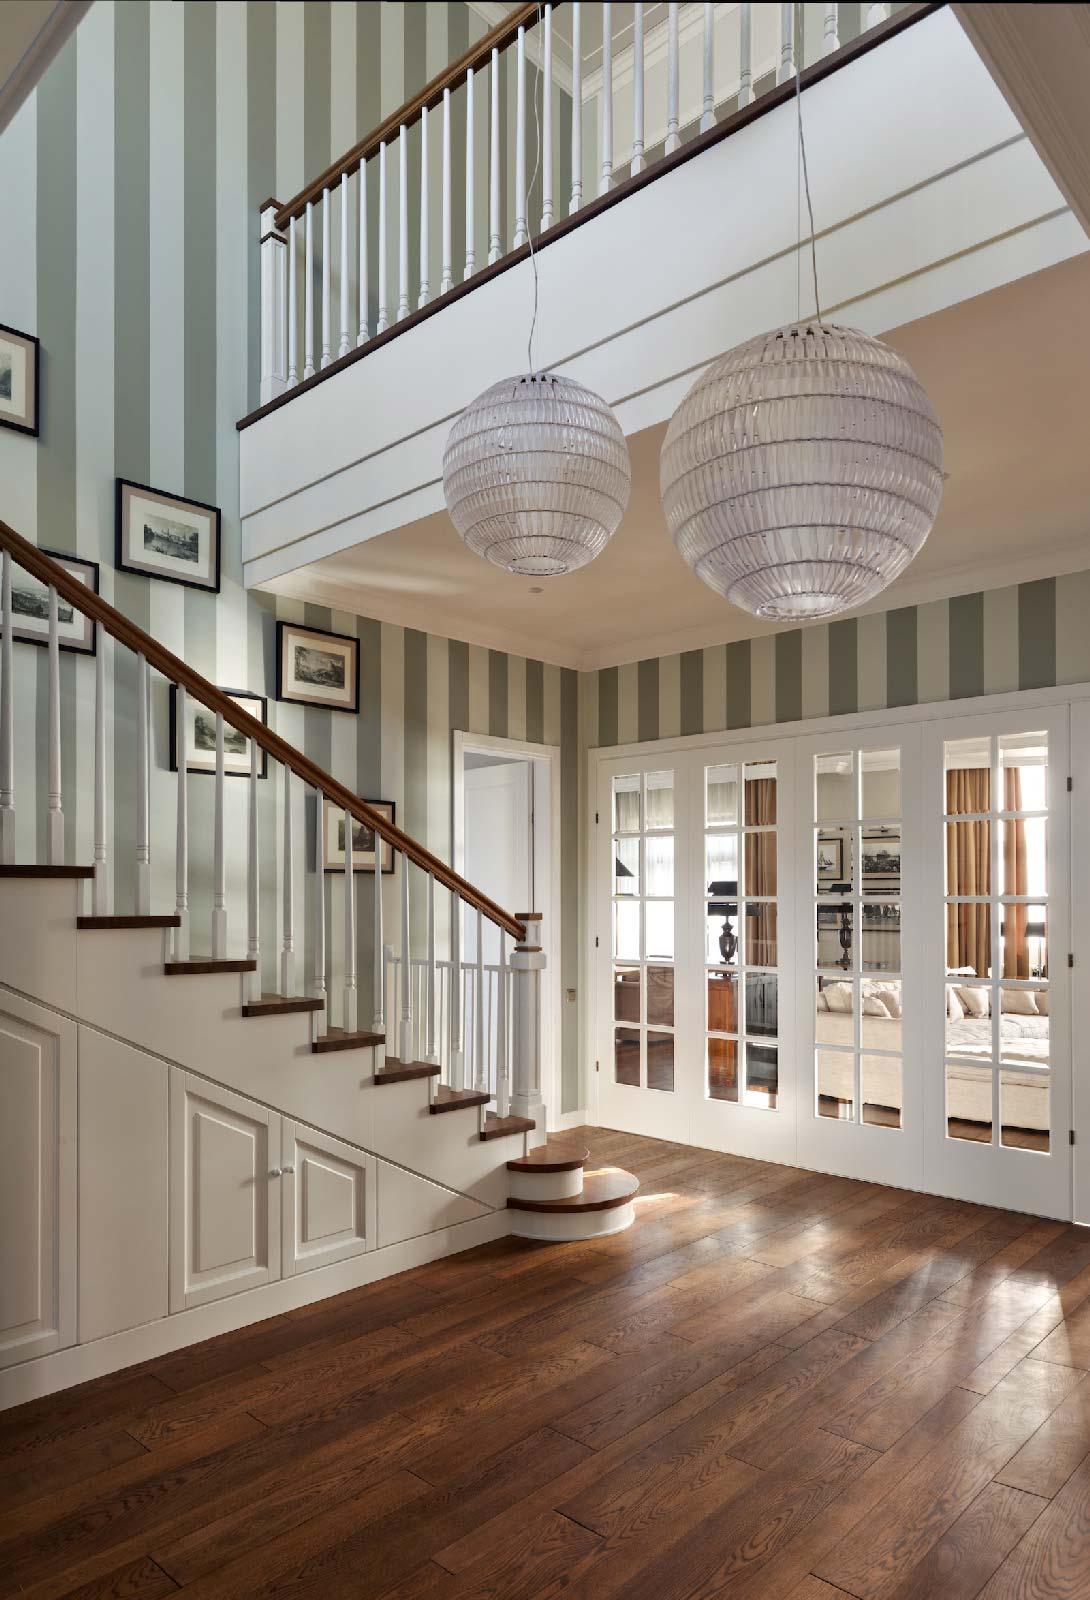 Studio Di Architettura In Inglese porte in stile inglese per una casa new classic | garofoli